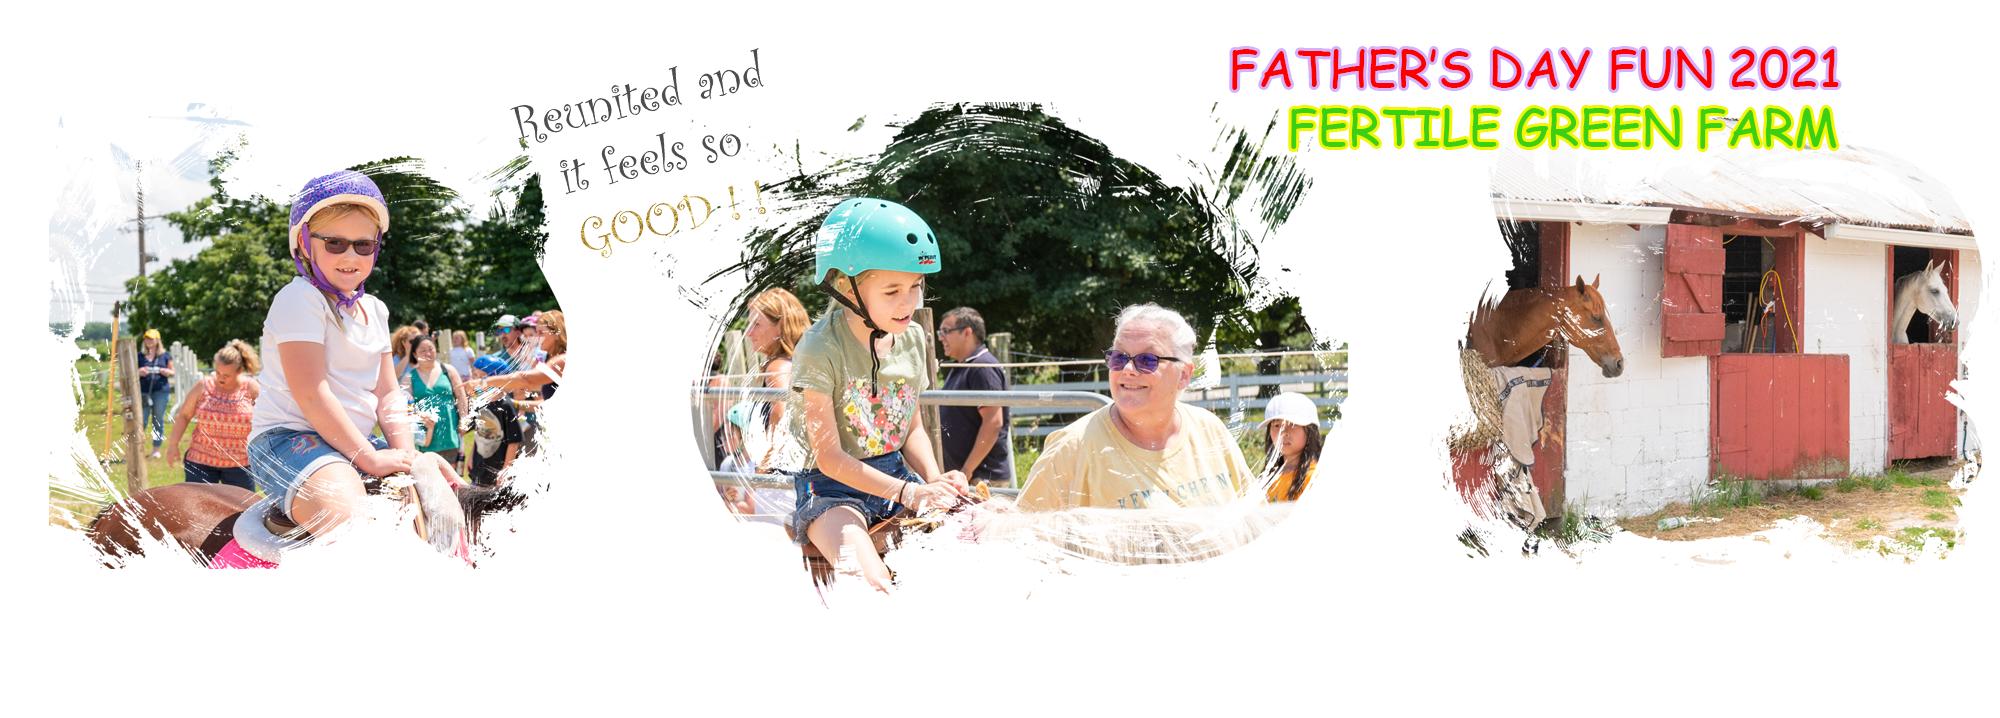 Father's Day at the Fertile Green Farm Equestrian